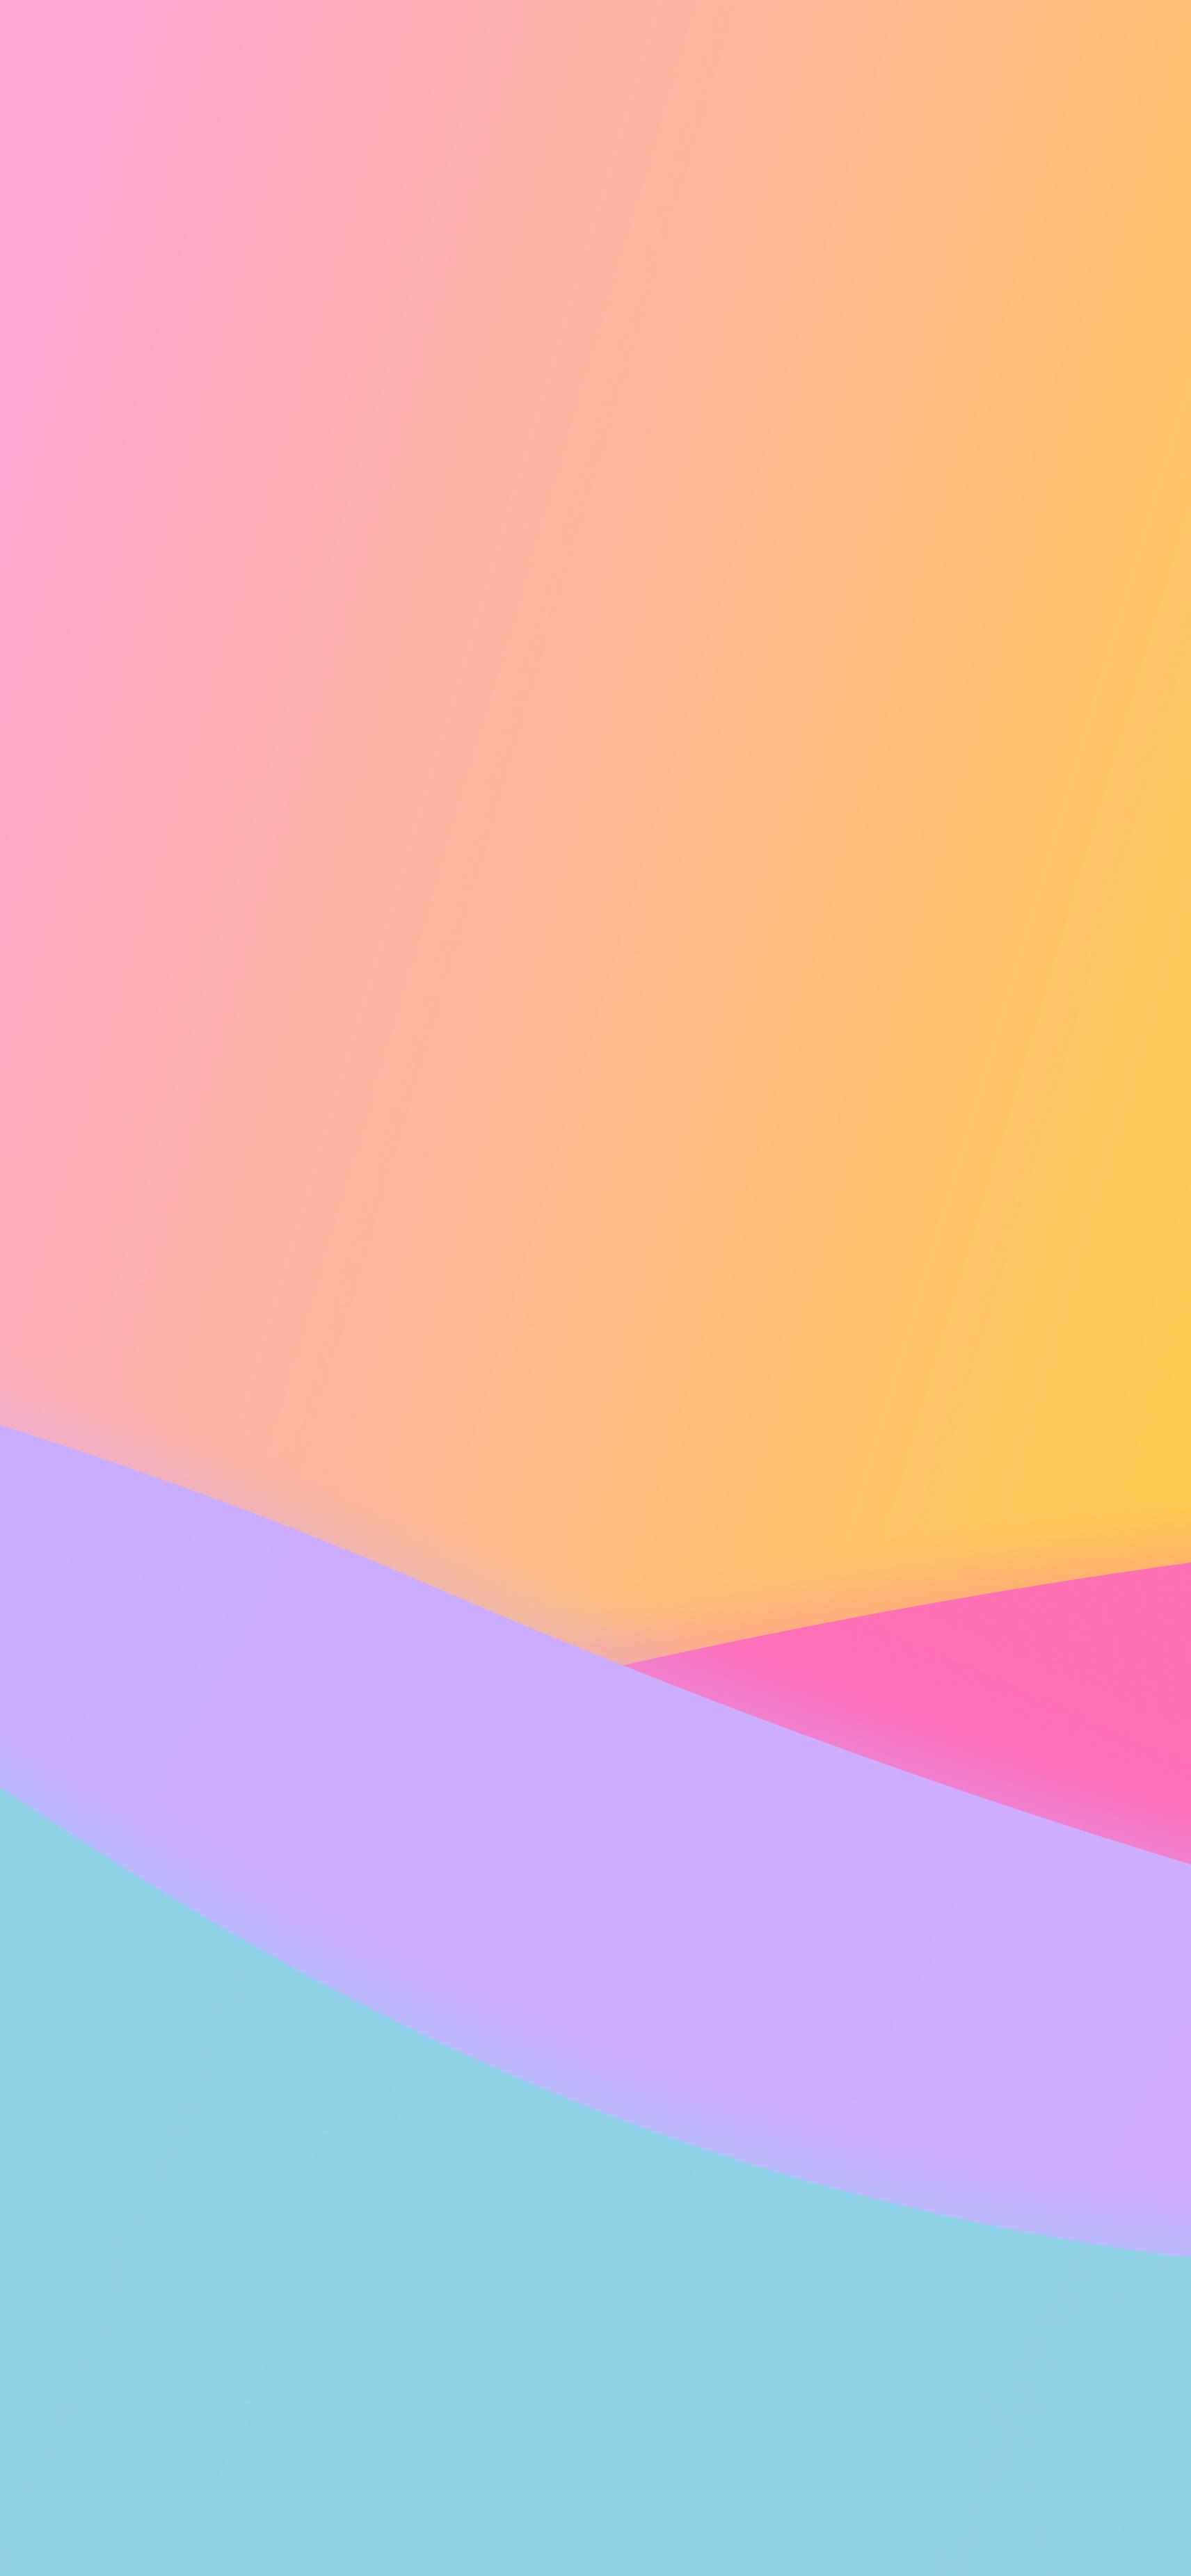 abstract gradient wallpaper iPhone mattbirchler idownloadblog waves